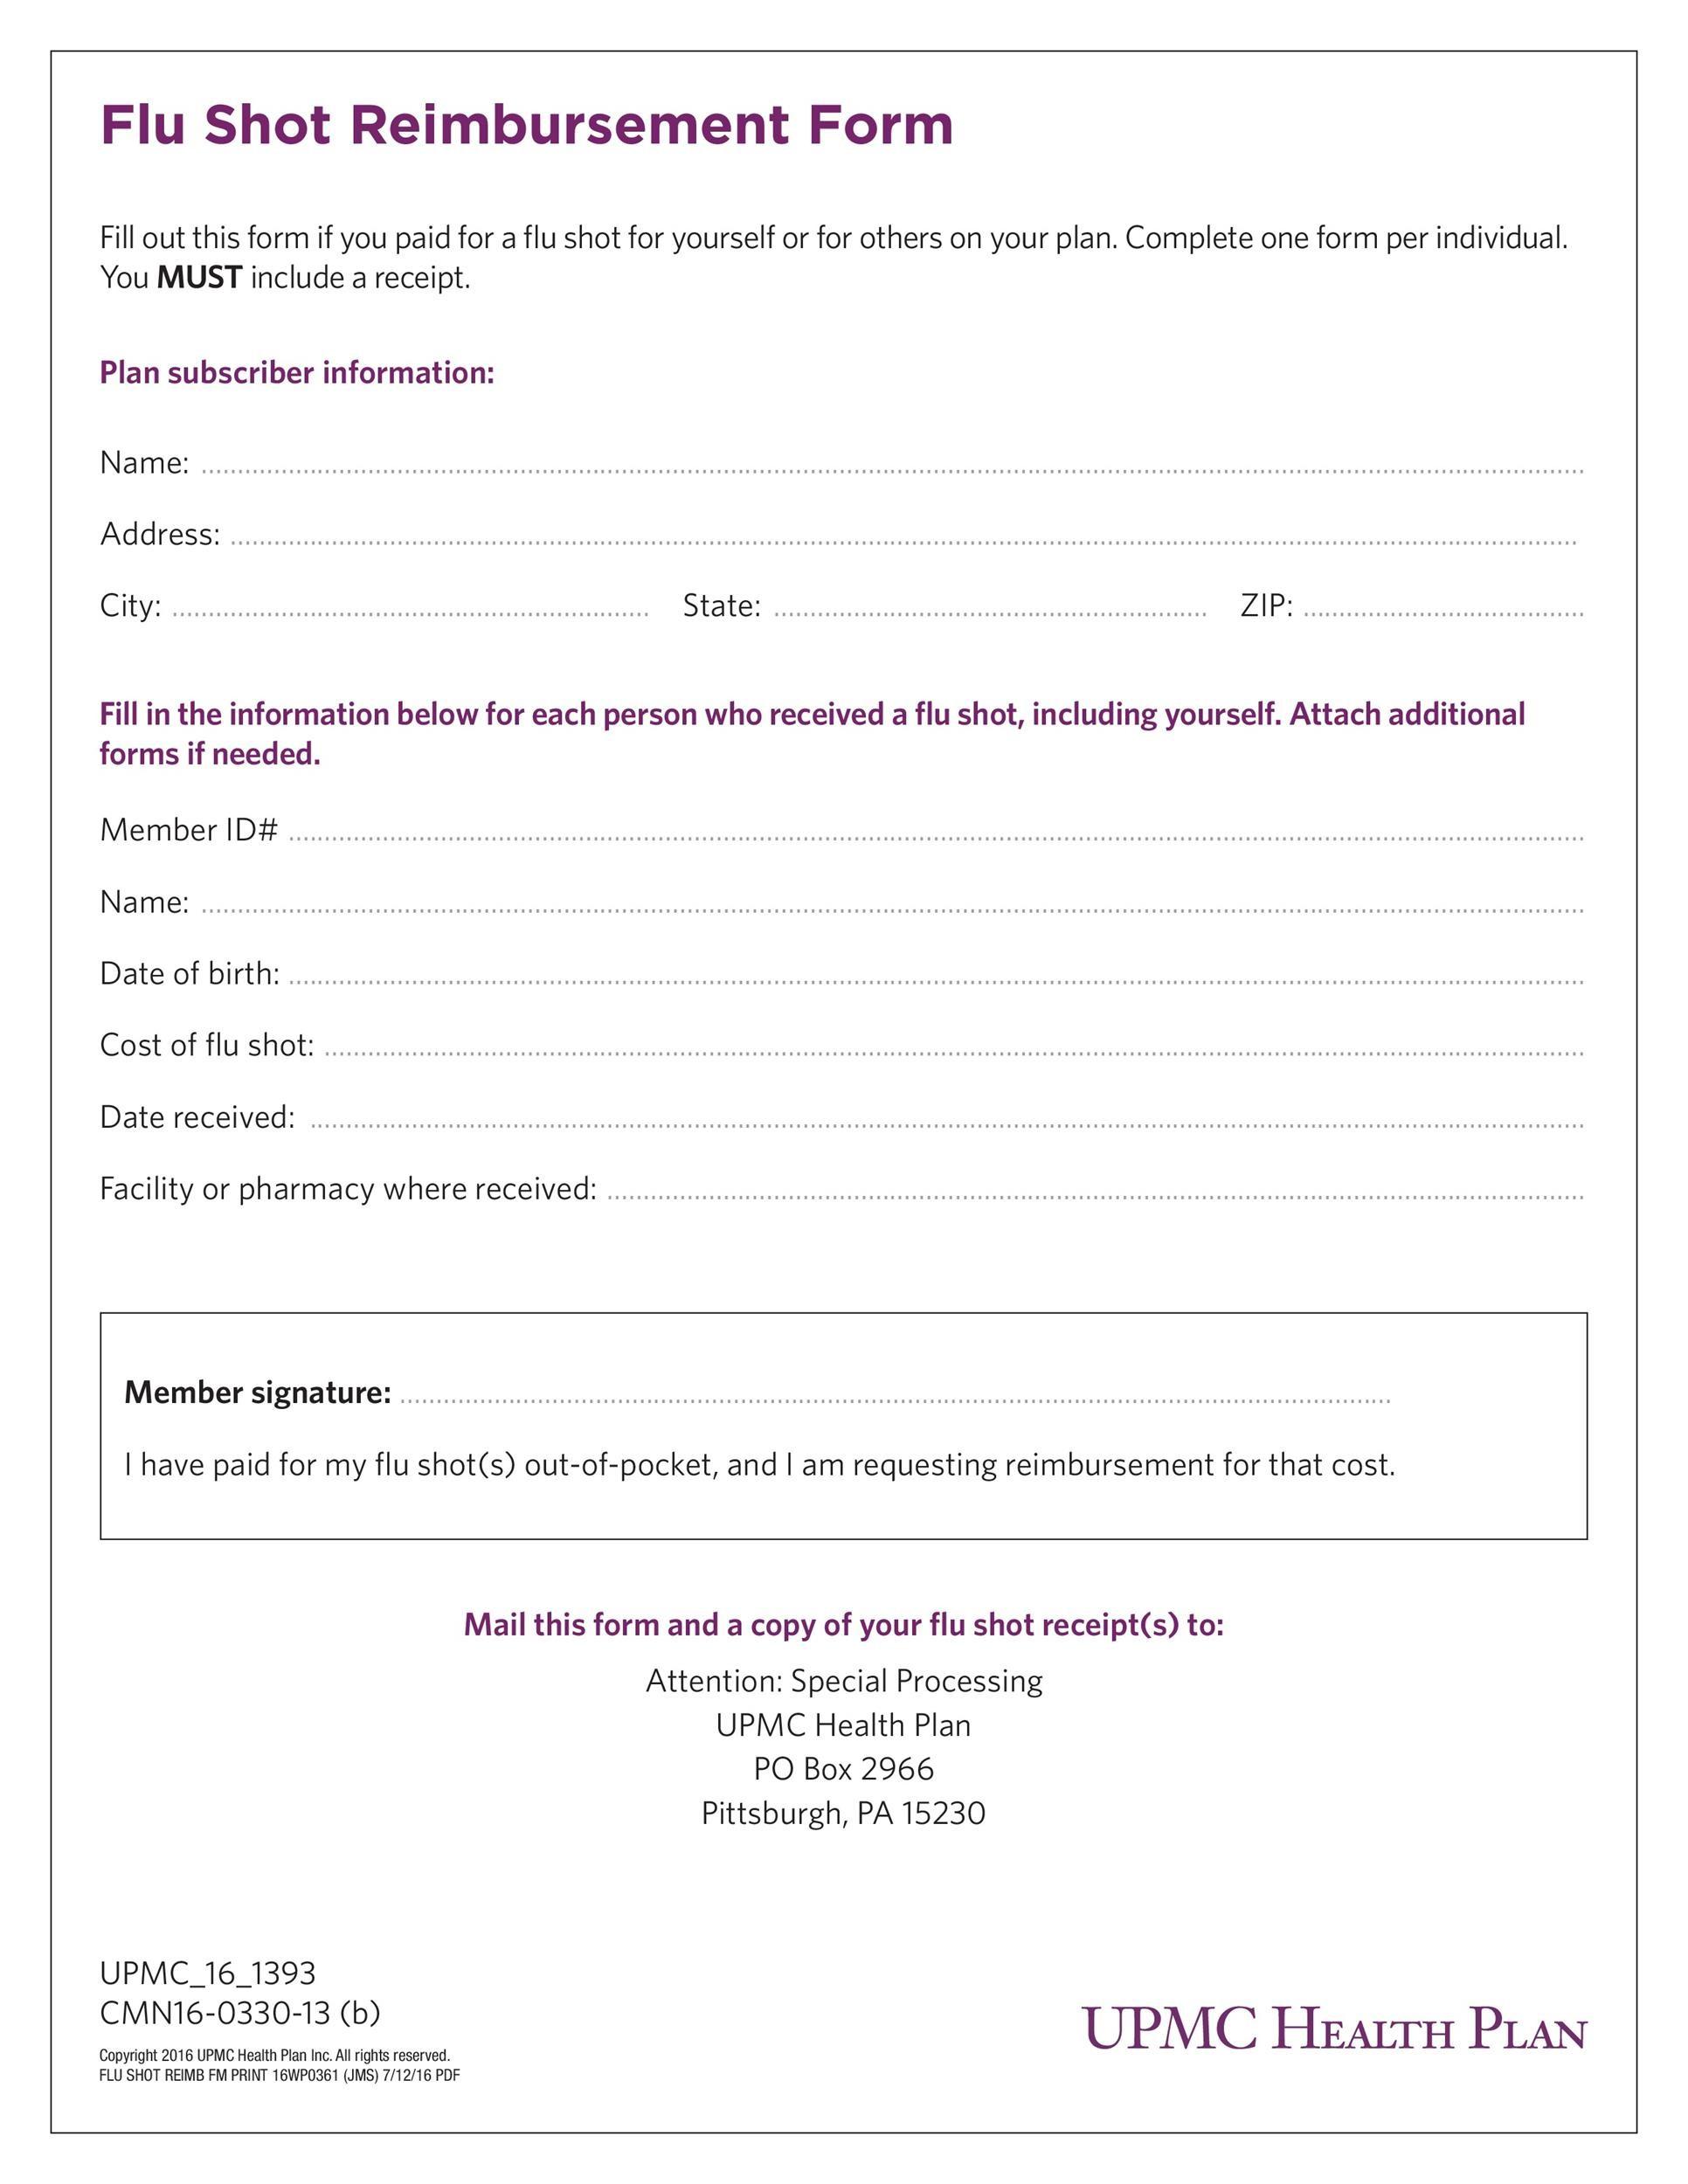 Free reimbursement form 12